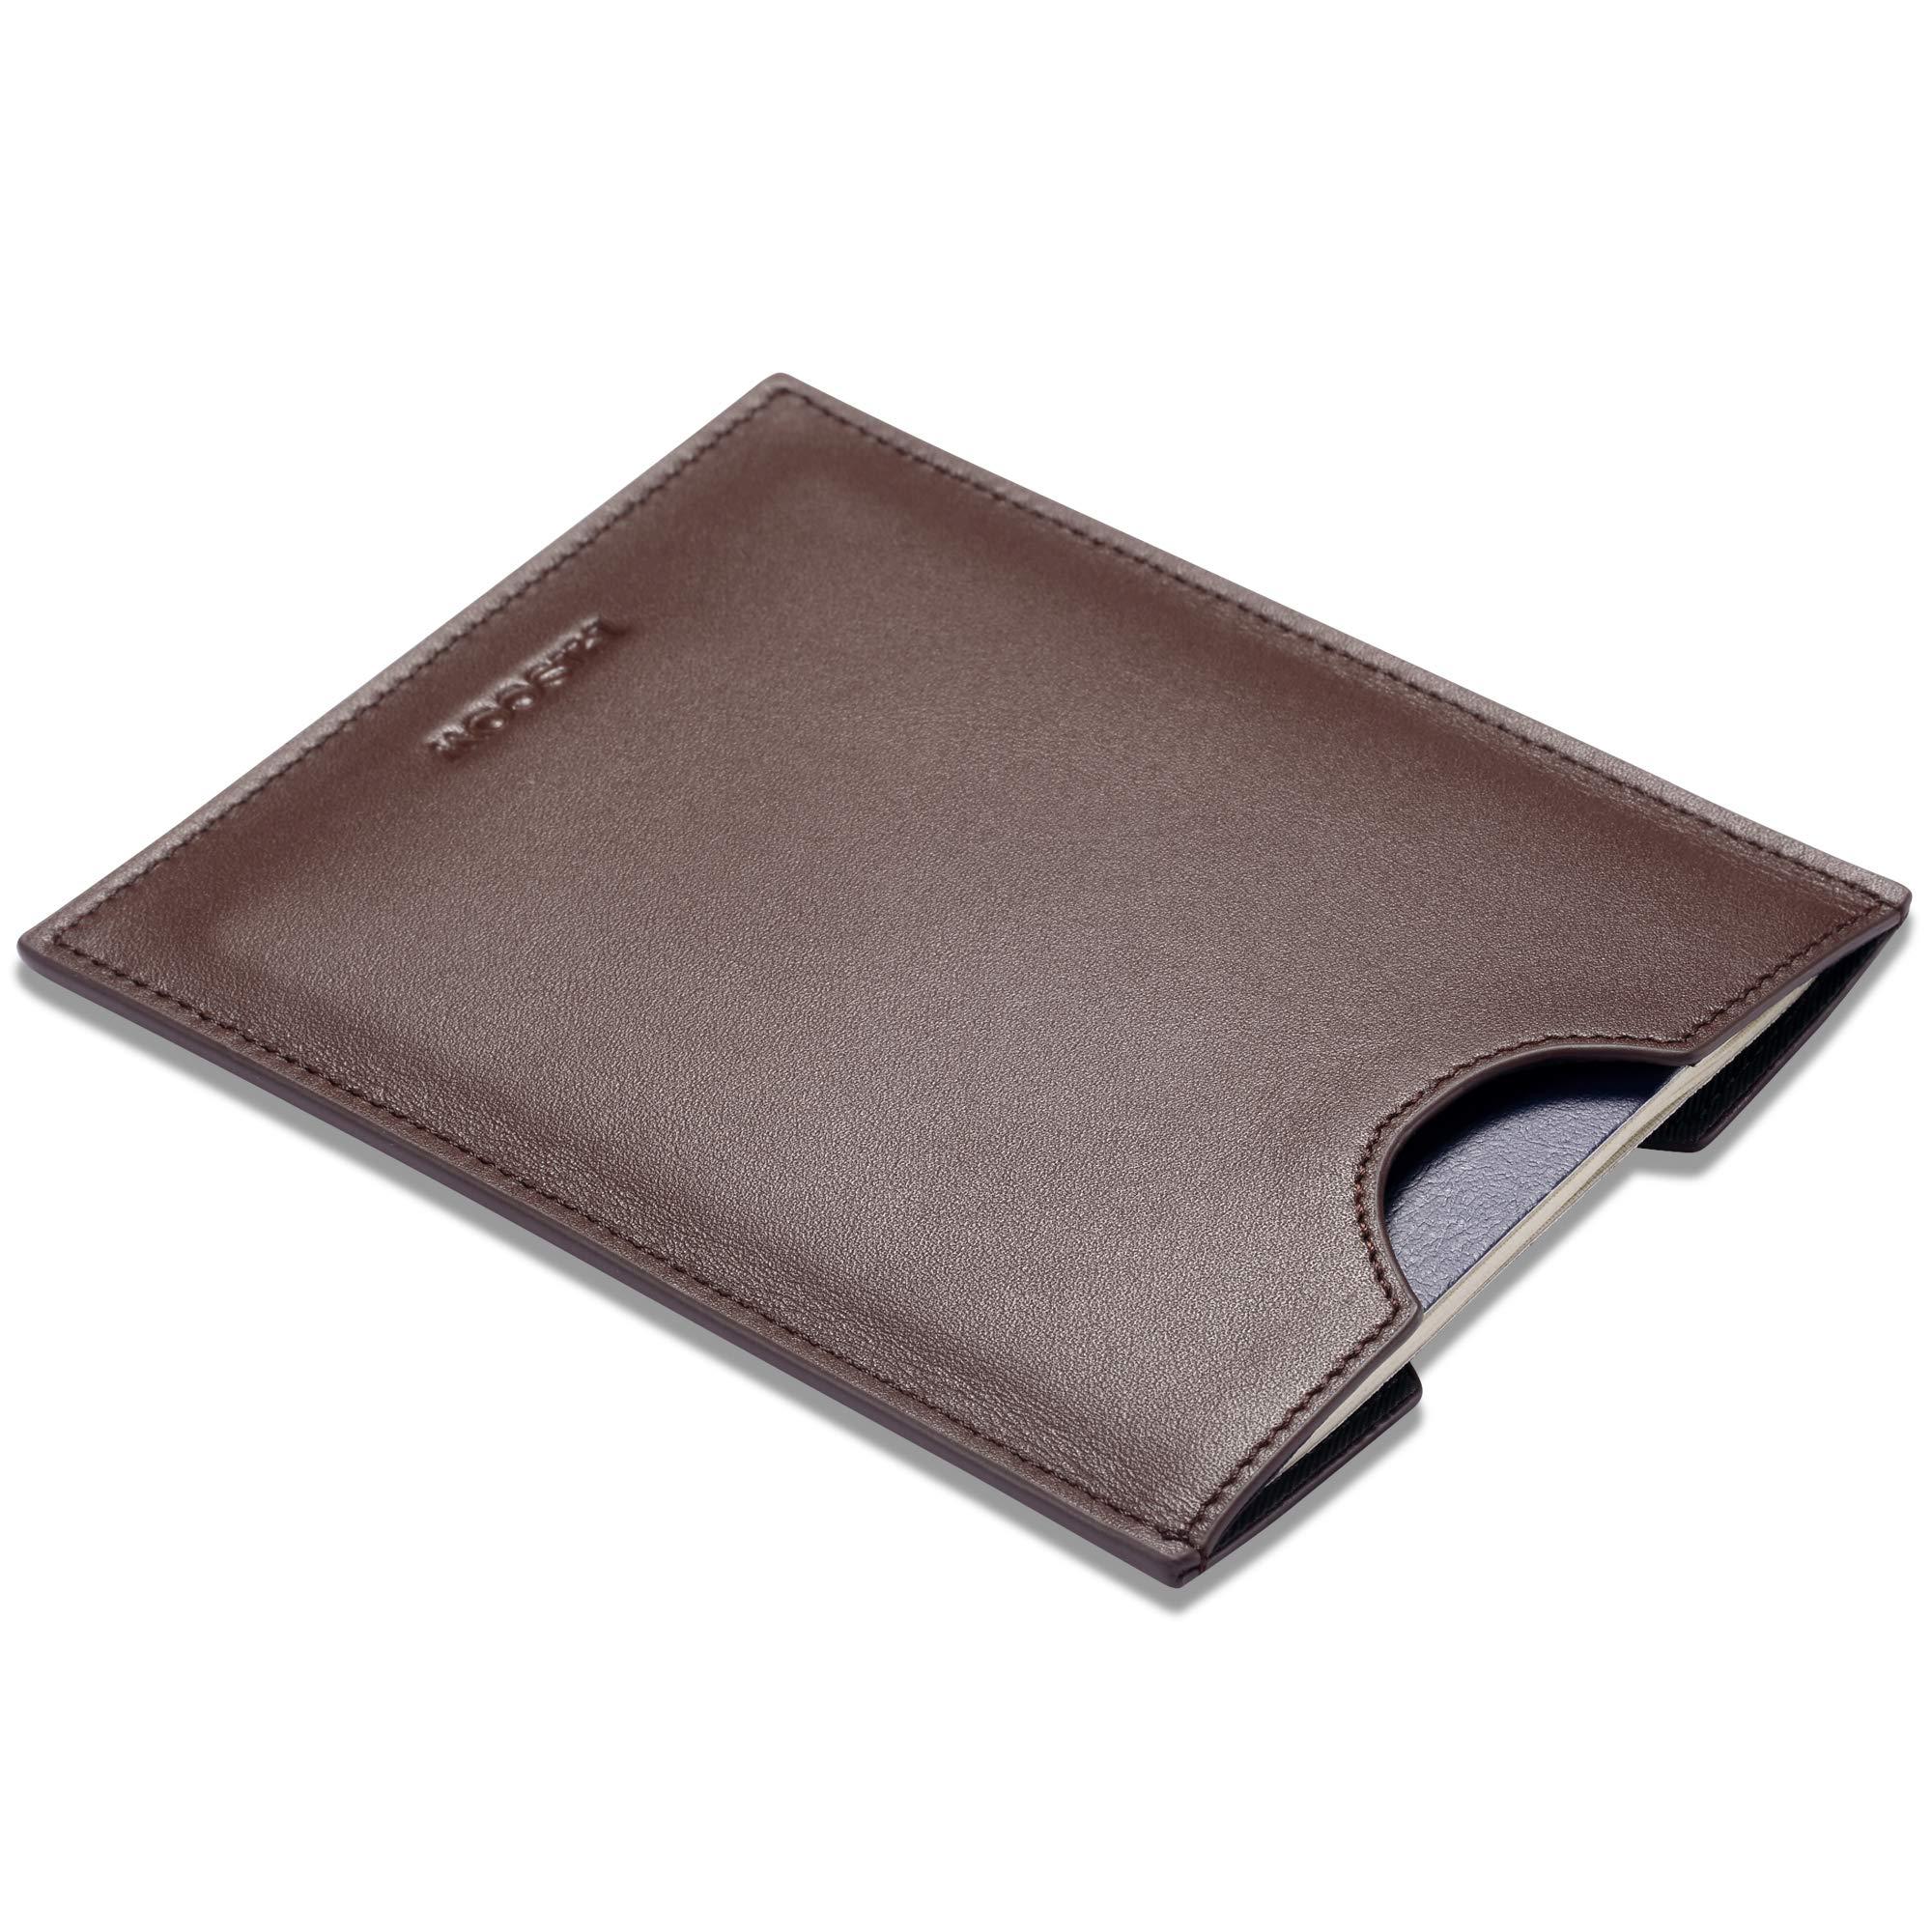 HISCOW Minimalist Passport Sleeve - Italian Calfskin (Brown) by HISCOW